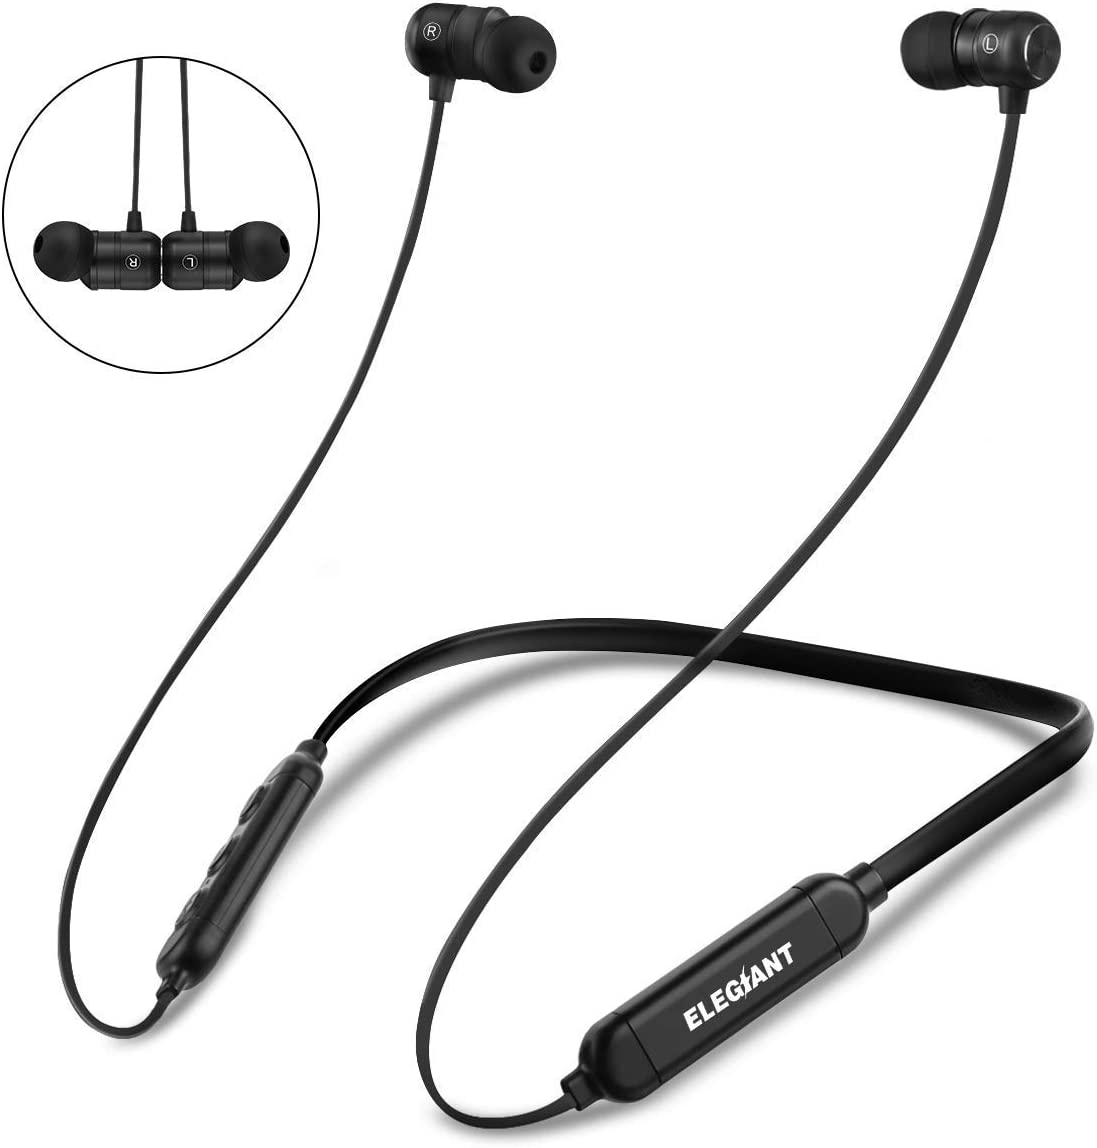 ELEGIANT Auriculares Bluetooth 5.0 Deportivos, Inalámbricos IPX7 Impermeable para Deporte CVC 6.0 con Micrófono Manos Libres para iOS Android Música Correr Bicicleta Viajar Running Gimnasio, ECC